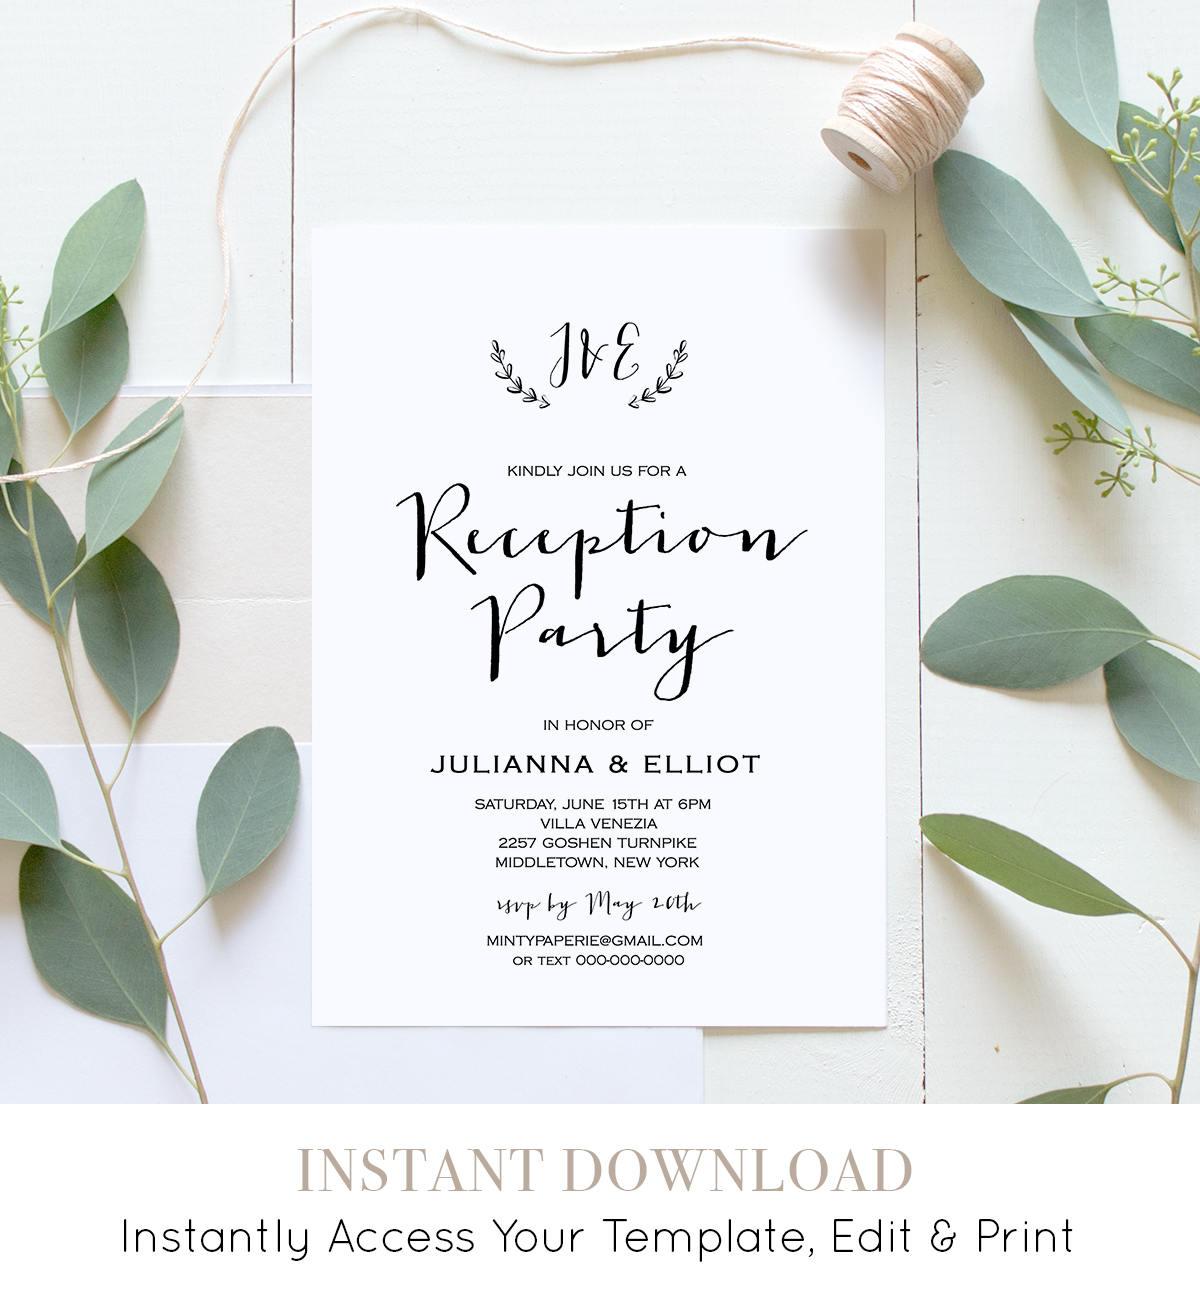 Reception Party Invitation Casual Wedding Reception Invite